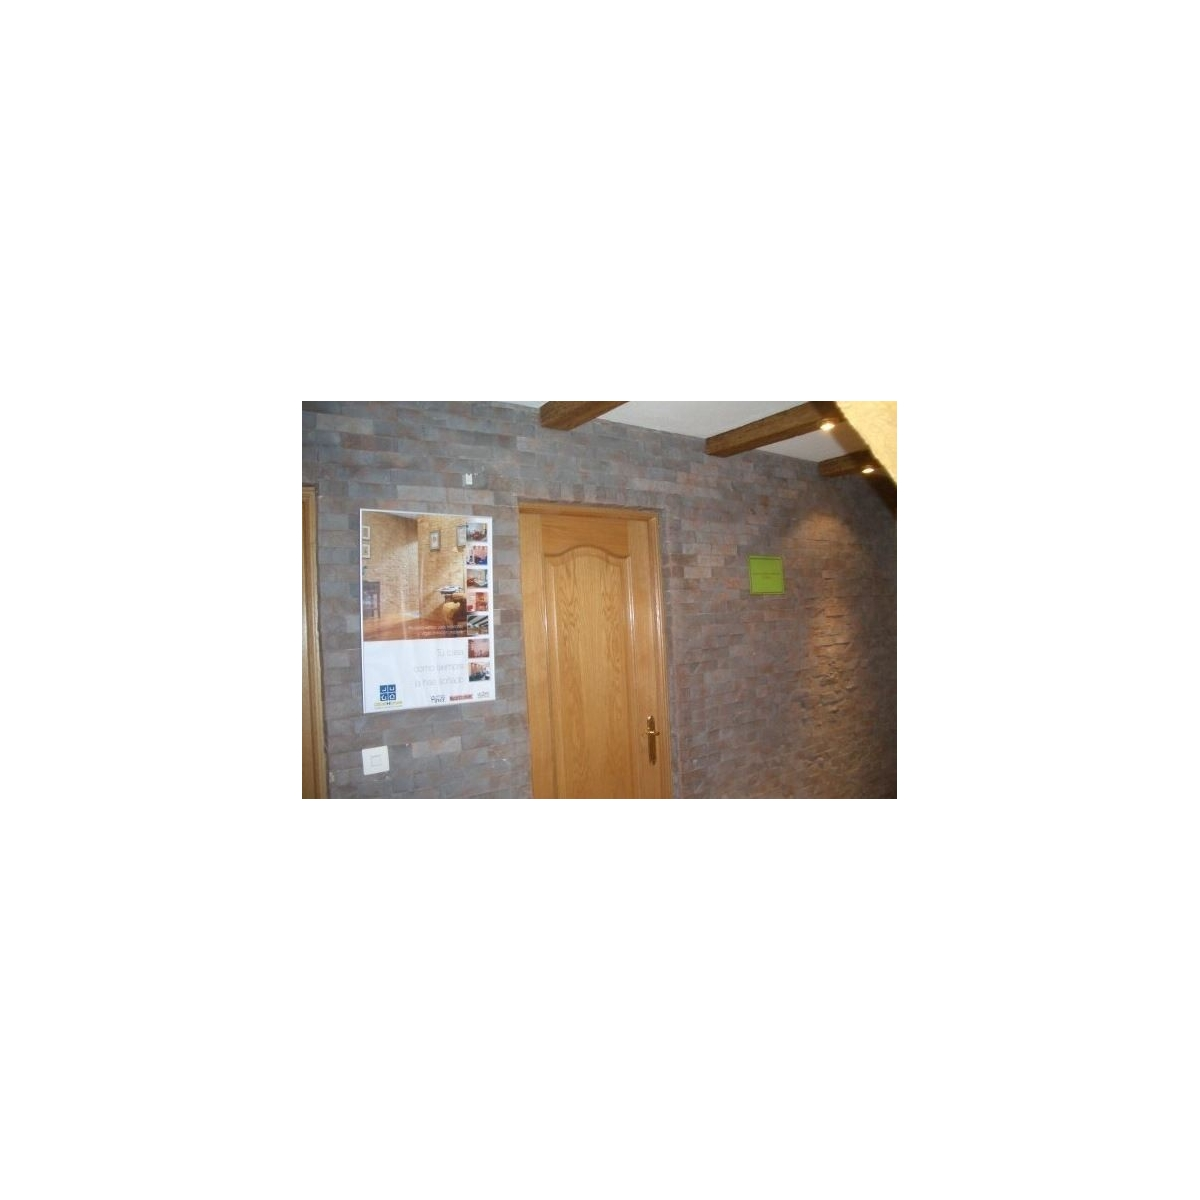 Plaqueta ángulo R51 Viena (Caja 1.6ml) - Revestimiento con Plaquetas de yeso - Marca Revesti-Mur